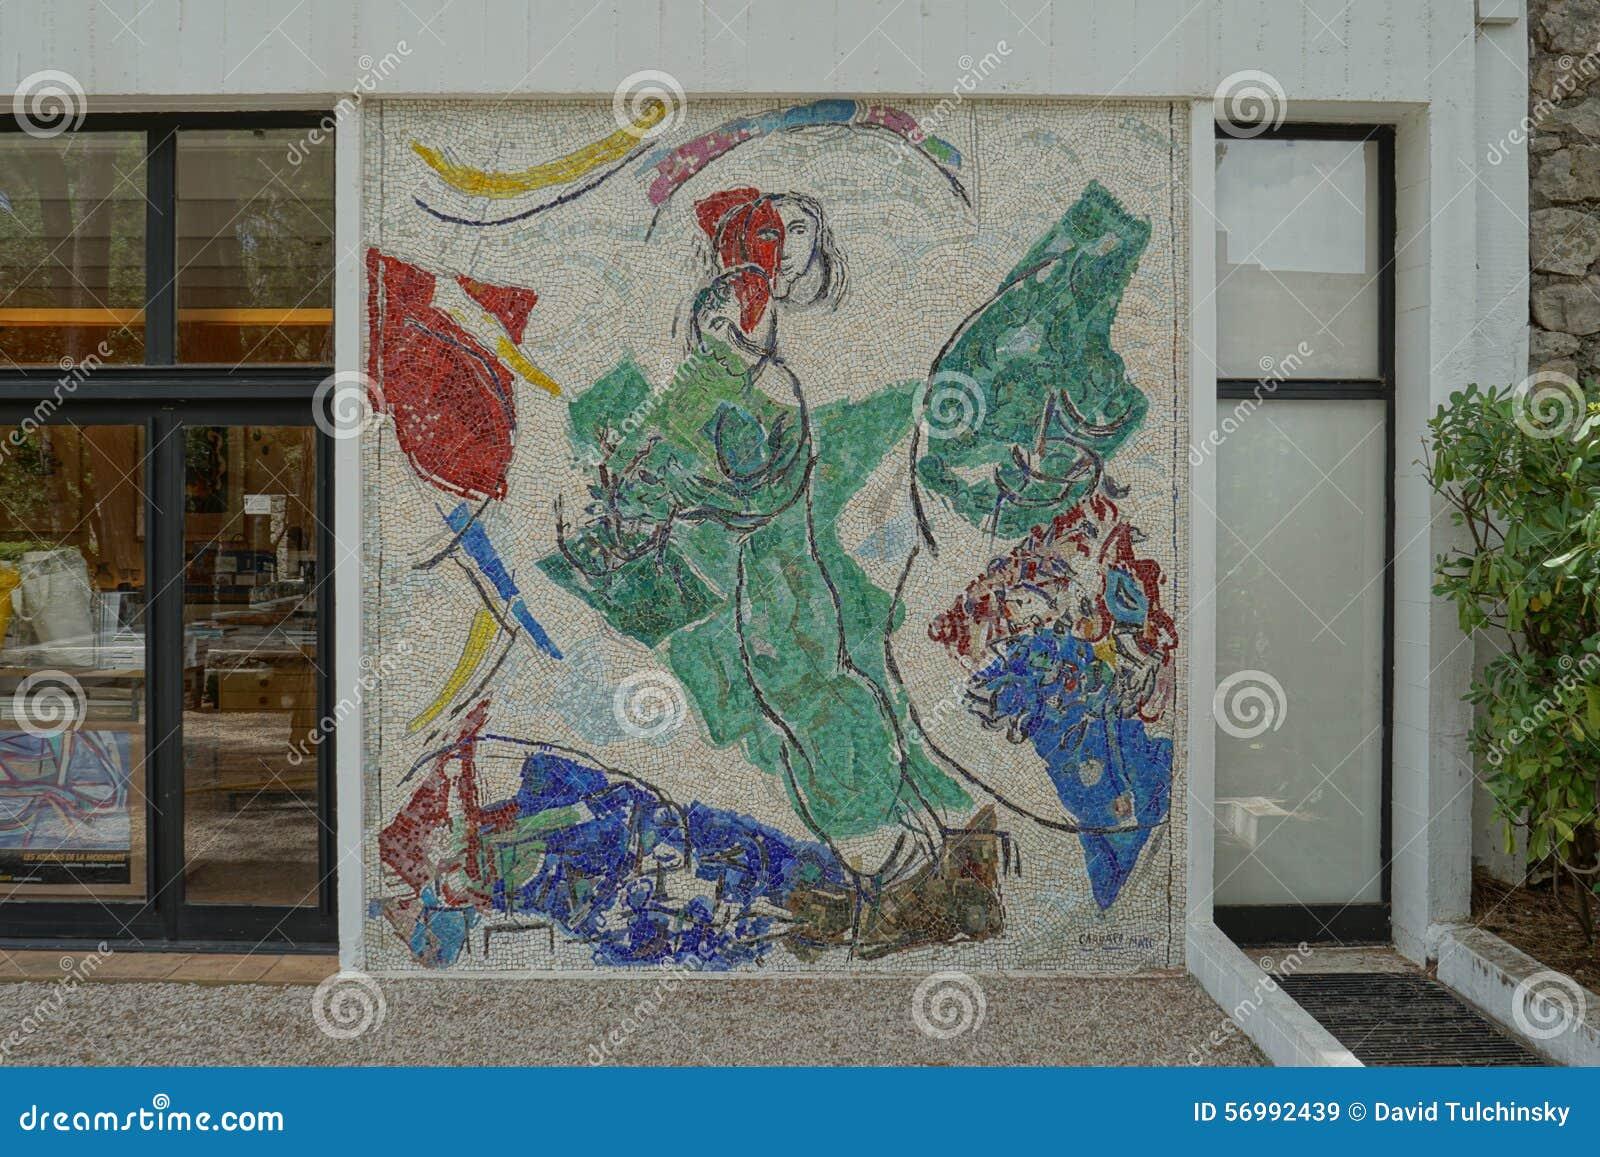 Fondation maeght saint paul de vence france editorial for Chagall st paul de vence